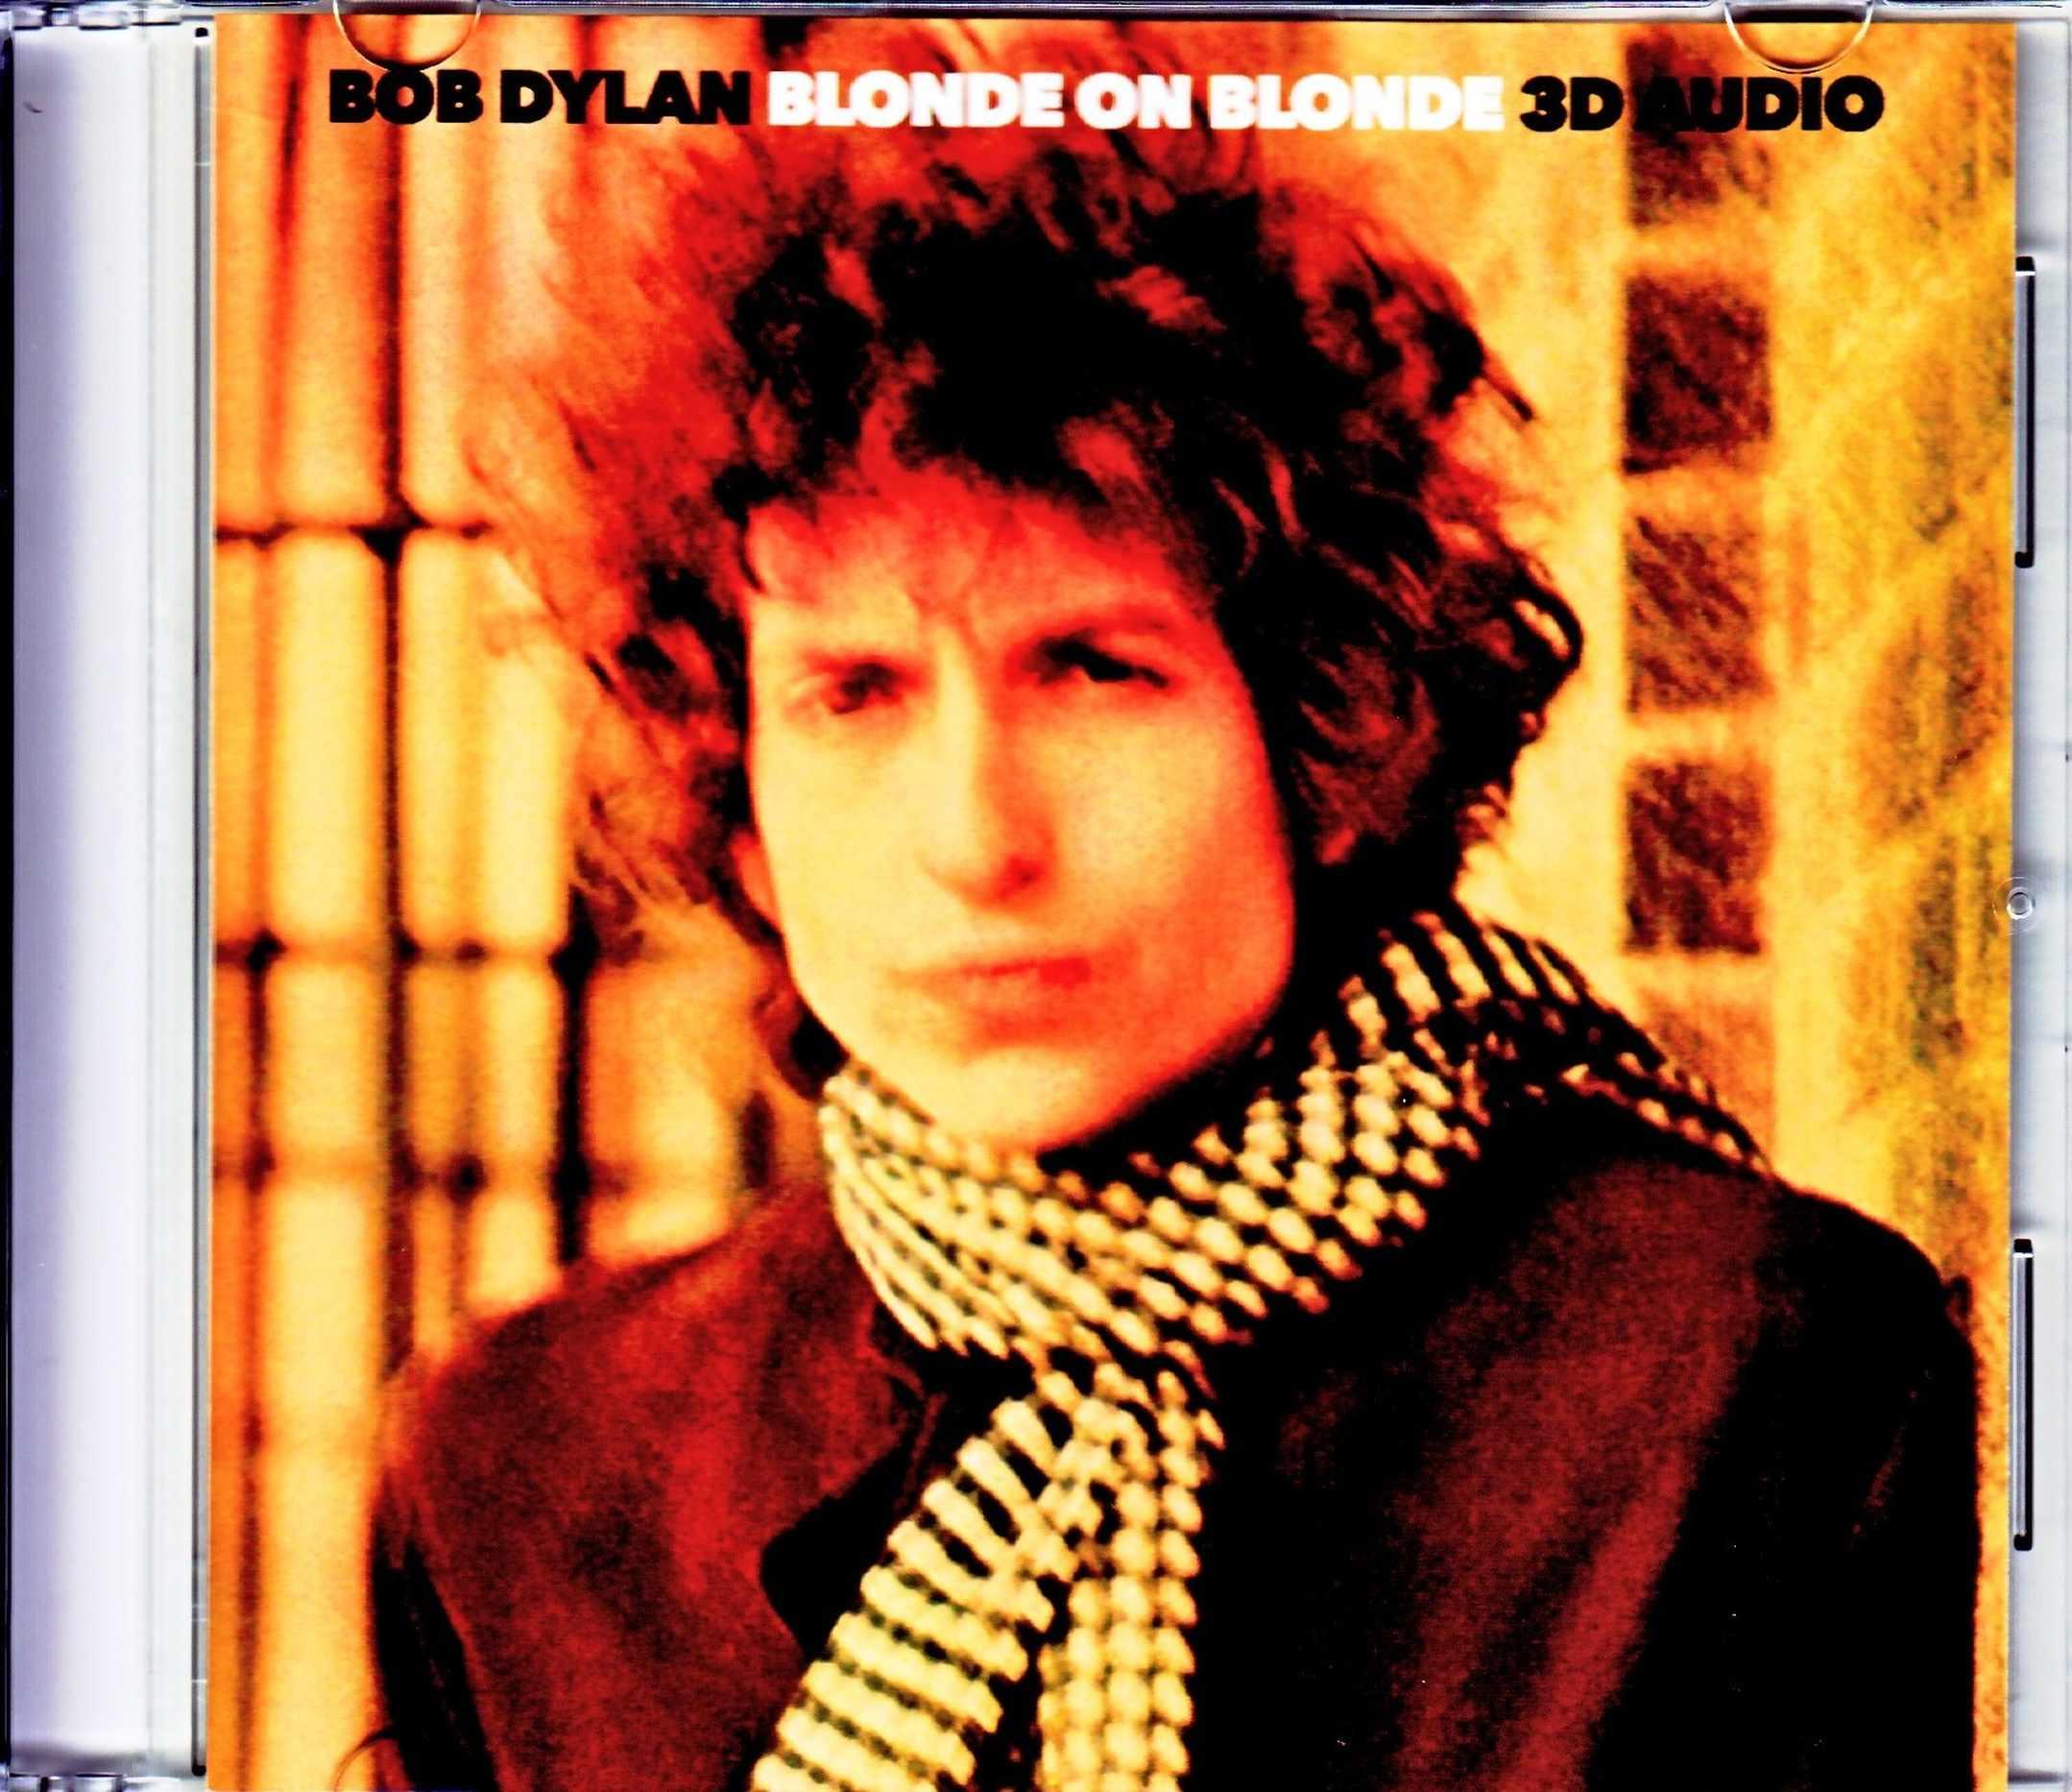 Bob Dylan ボブ・ディラン/ブロンド・オン・ブロンド Blonde on Blonde 3D Audio Version